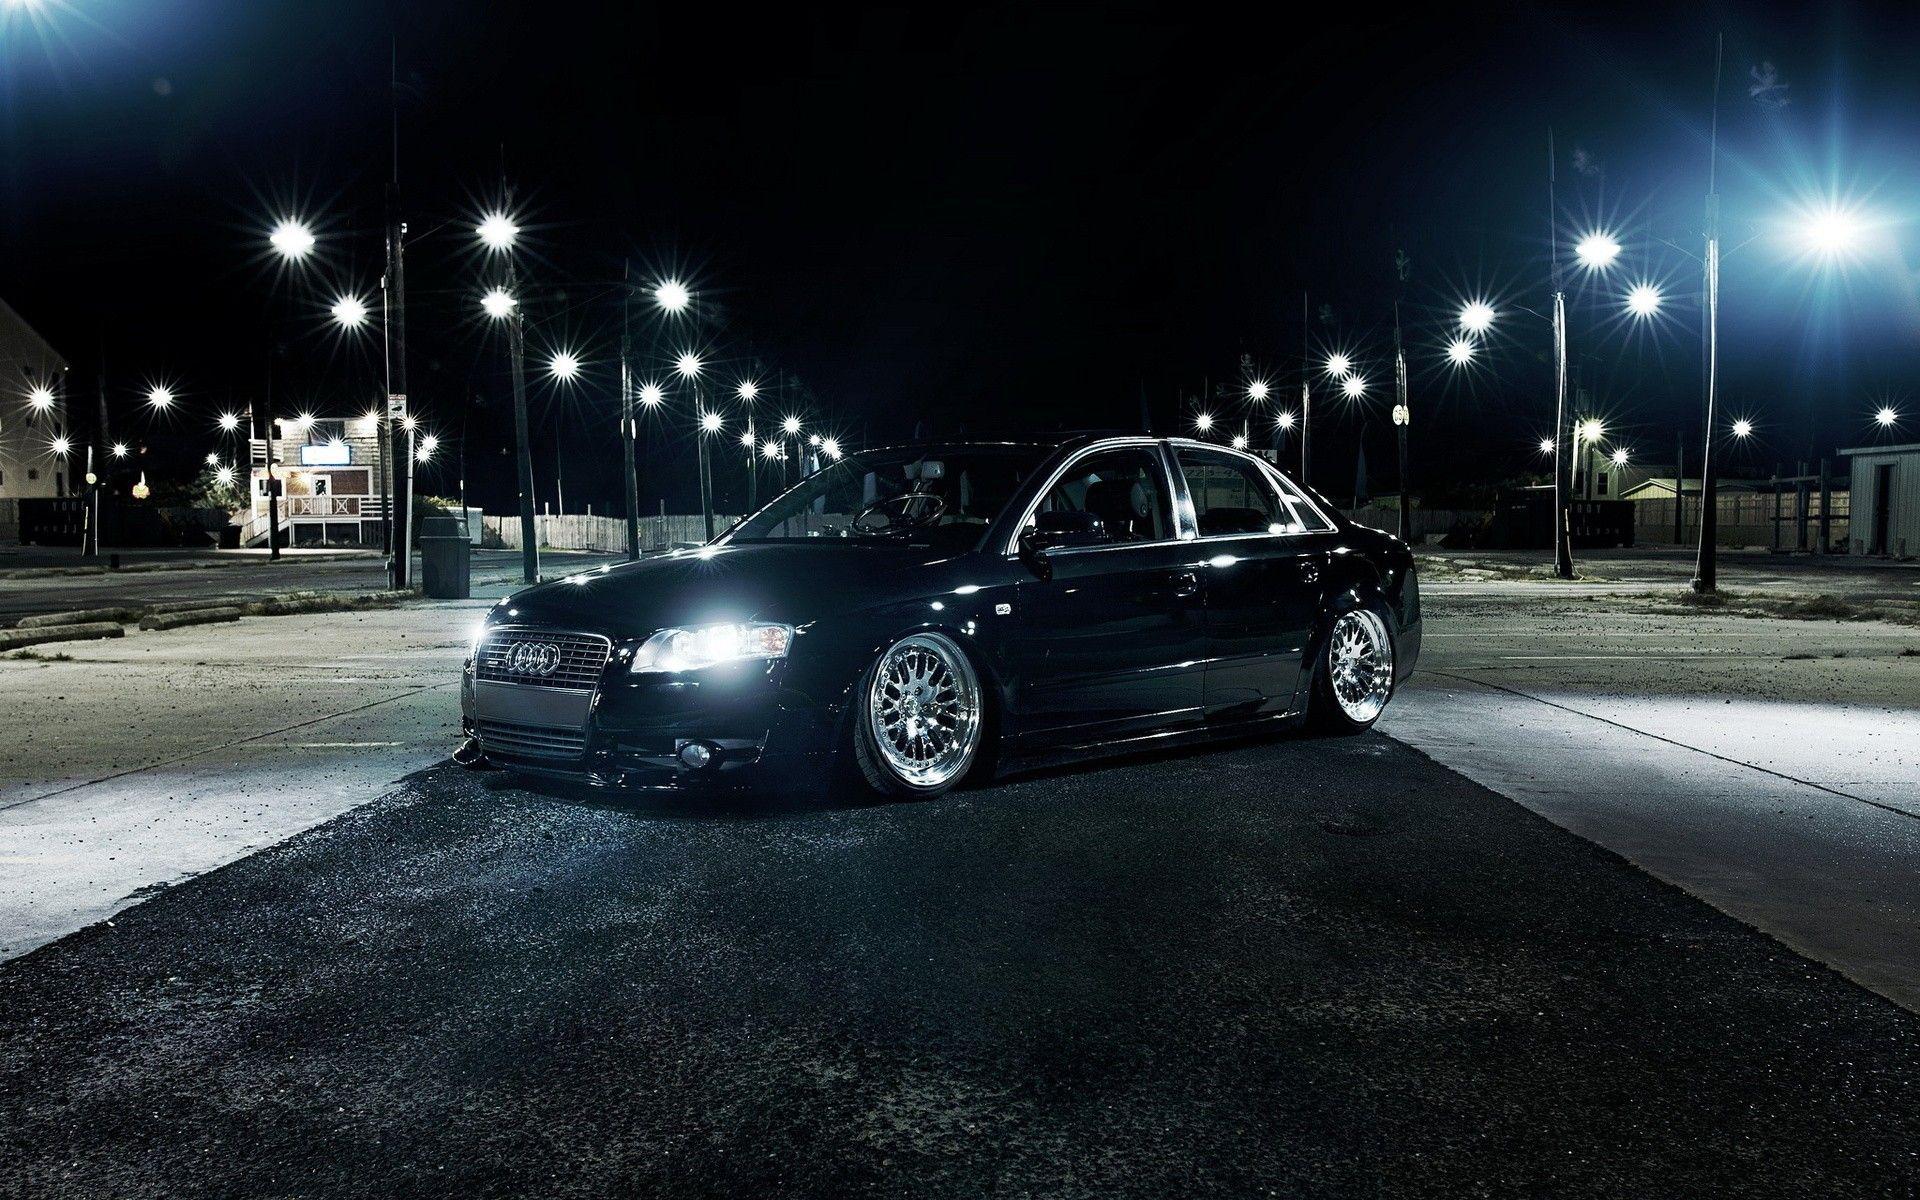 Pin By H K On Cars Wallpaper Audi Hd Wallpaper